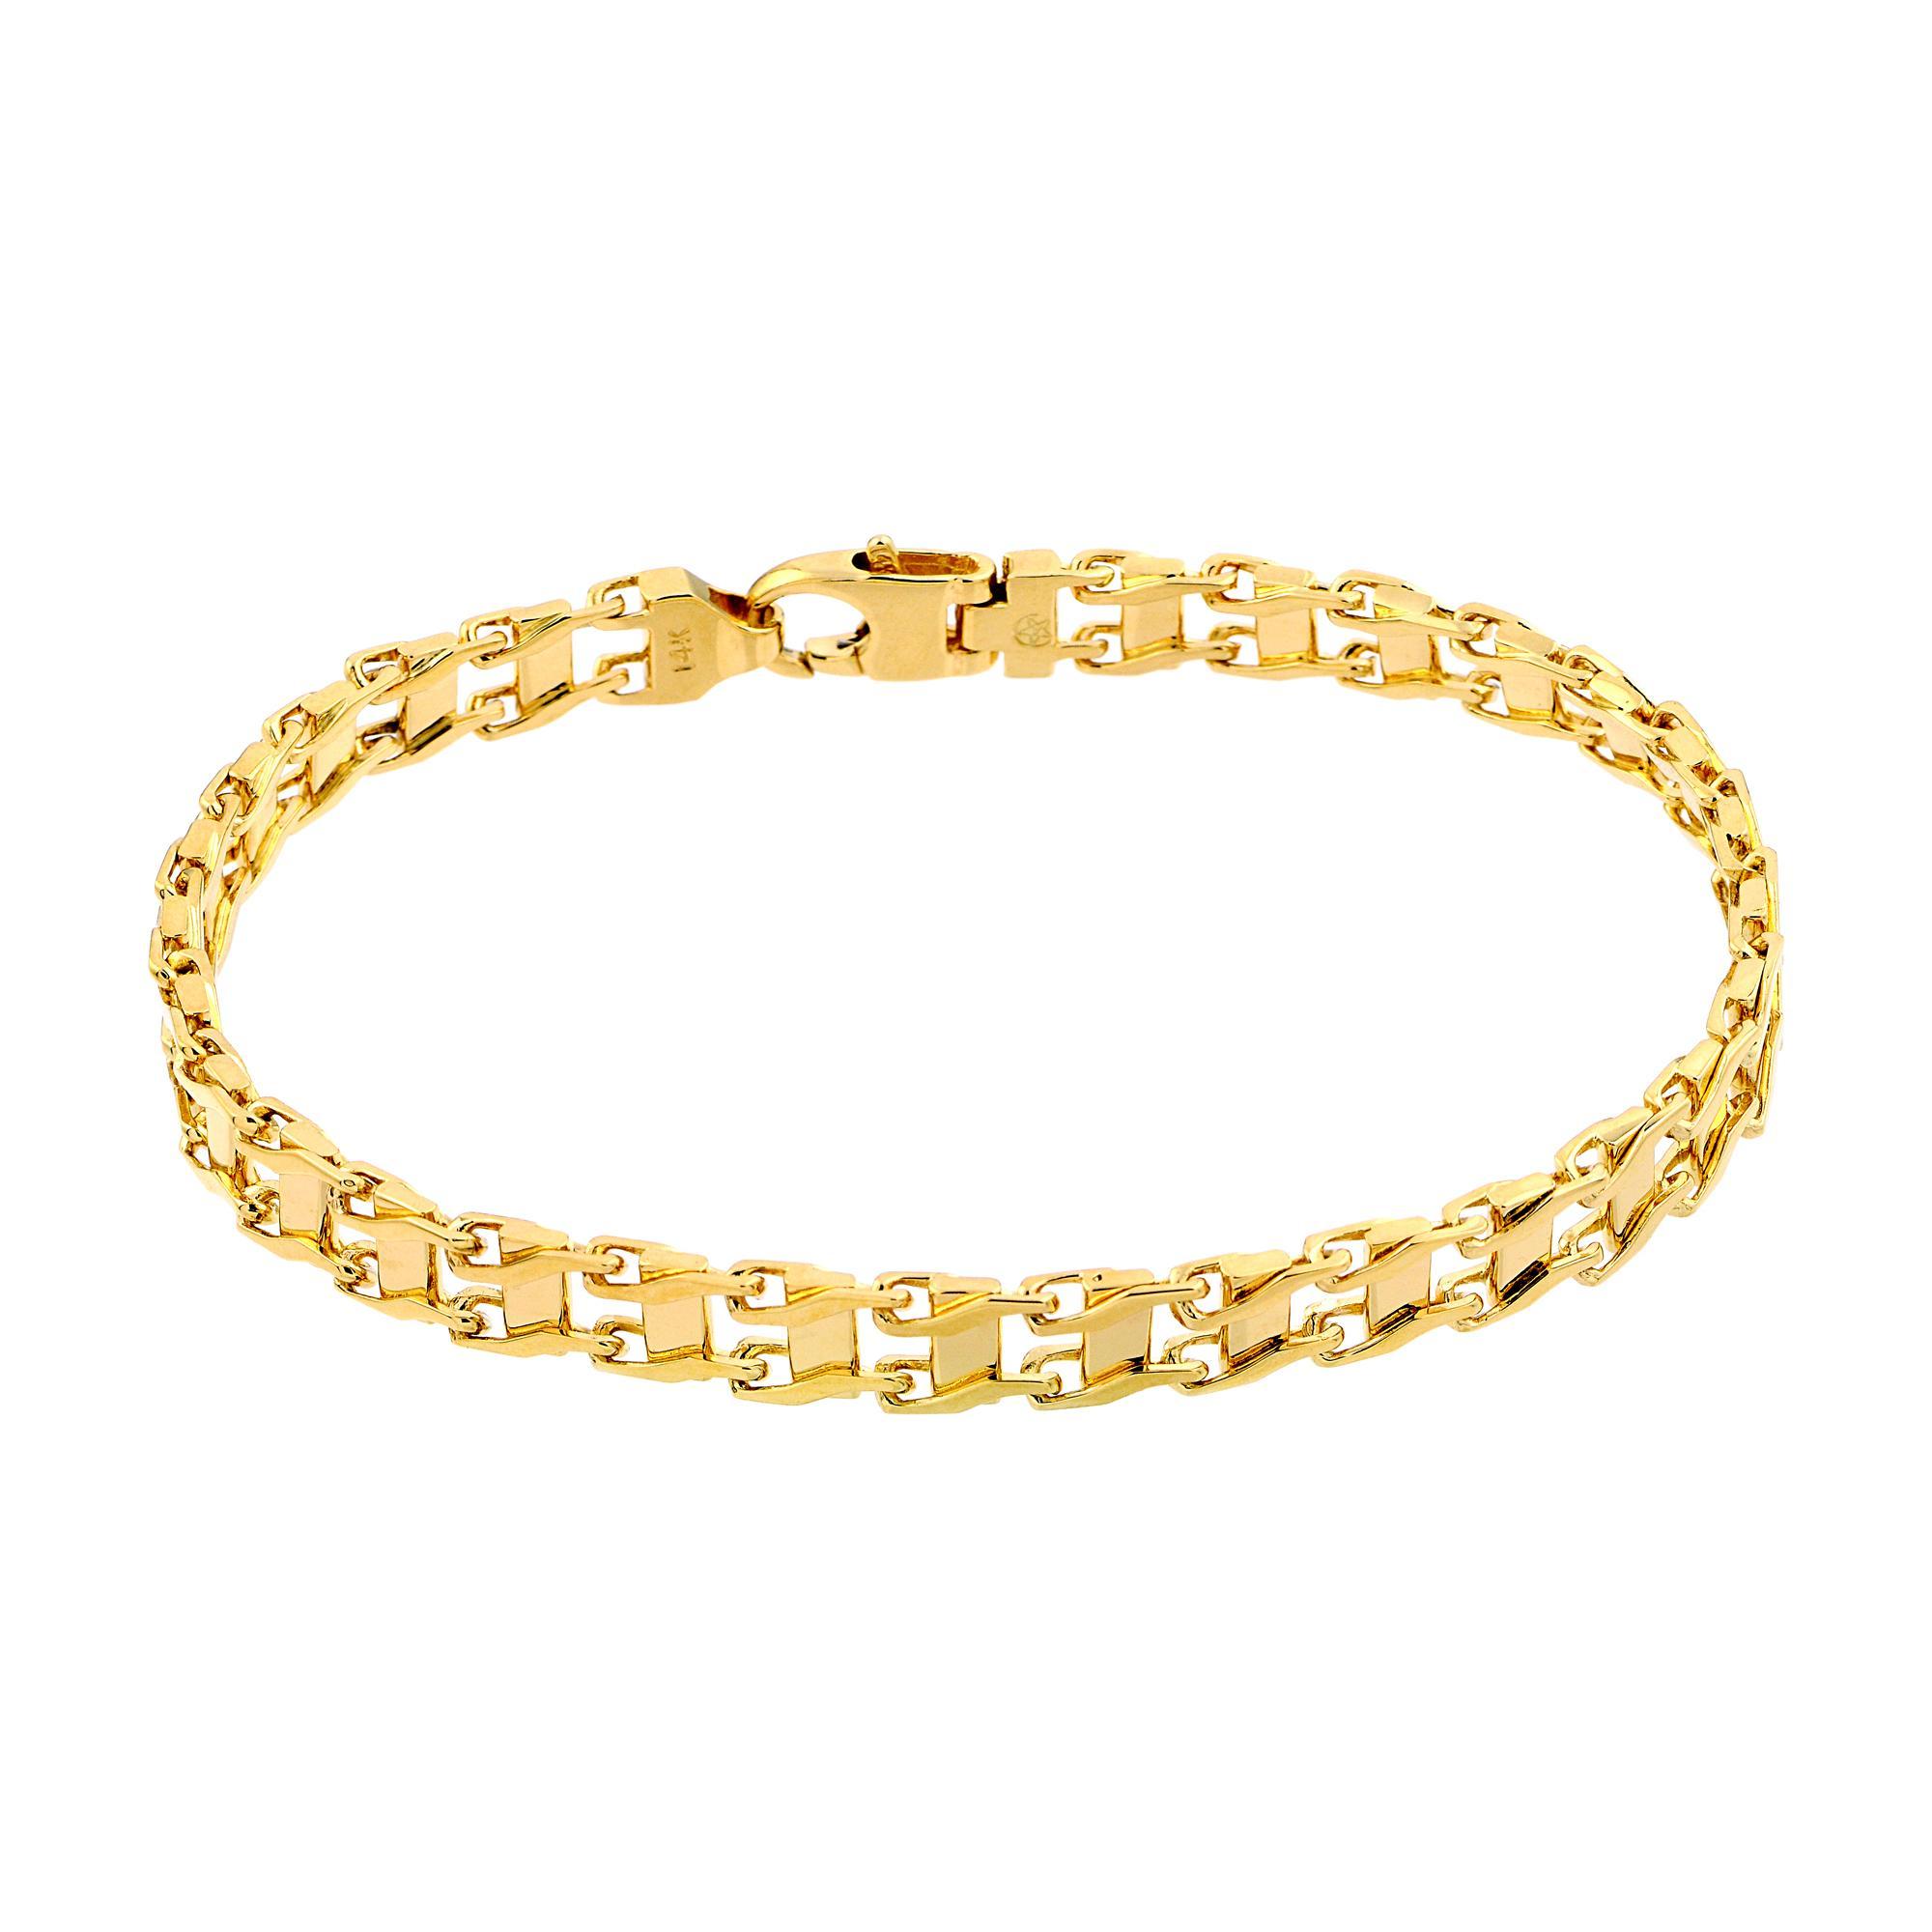 Amazon.com: Men's 14k White Gold Railroad Bracelet, 8.25